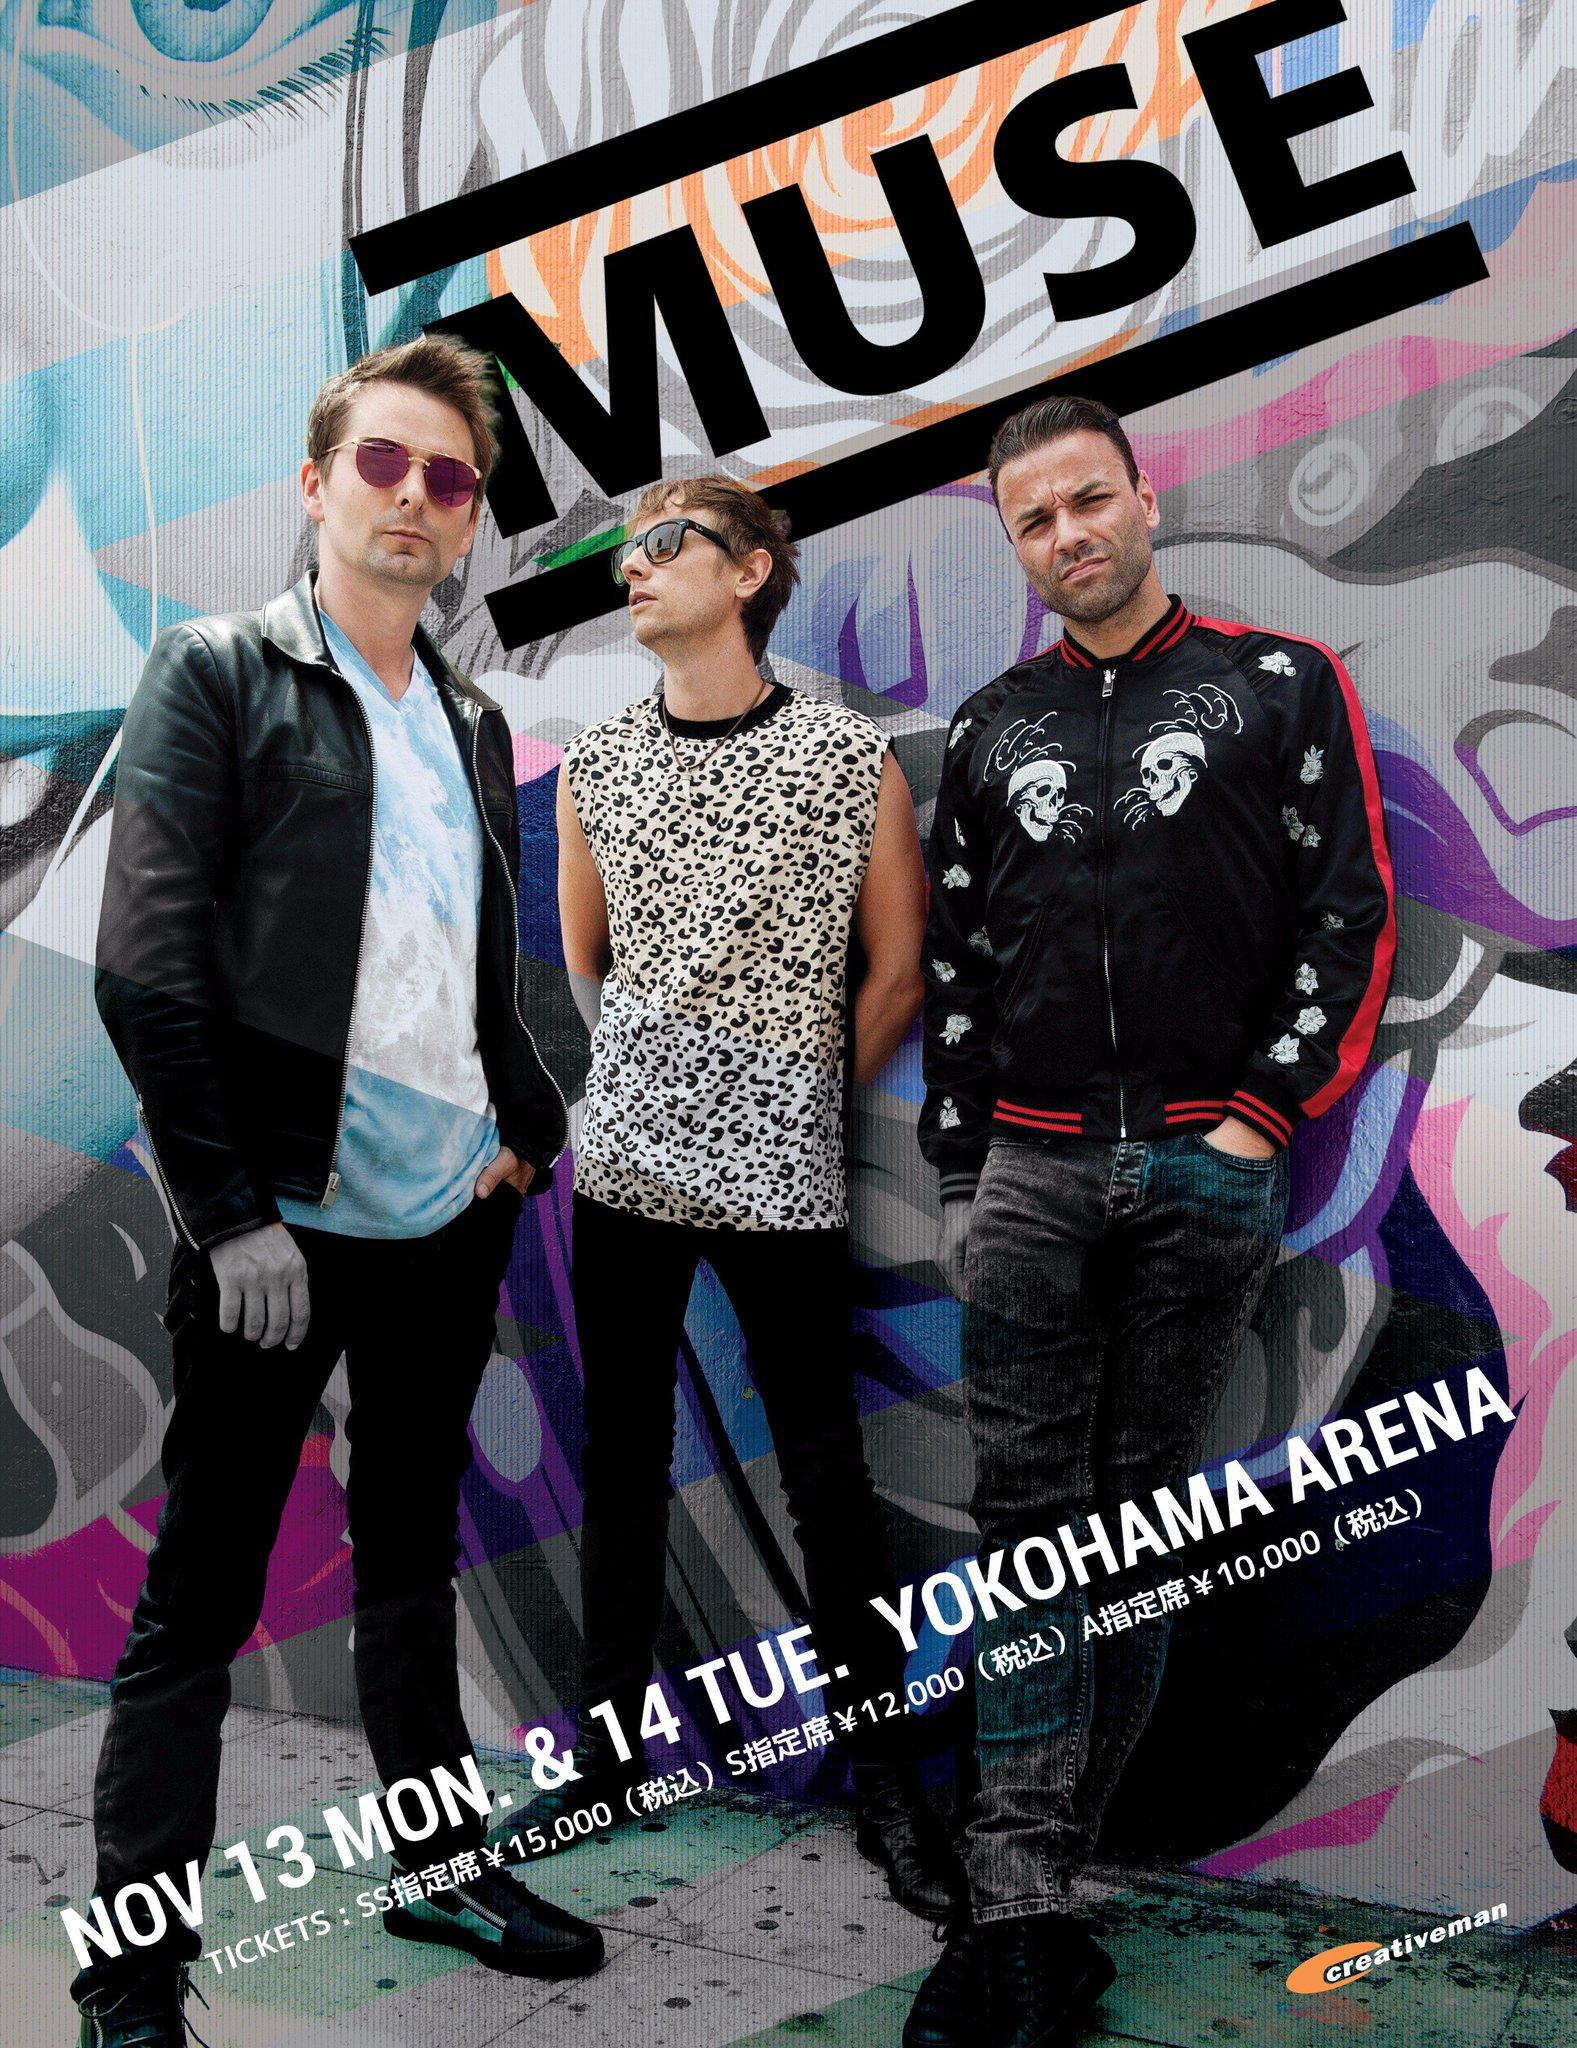 ����! Muse return to Japan on November 13th & 14th at the Yokohama Arena.  Details: https://t.co/zJlUNpJQex https://t.co/Mmkxv7qkpD